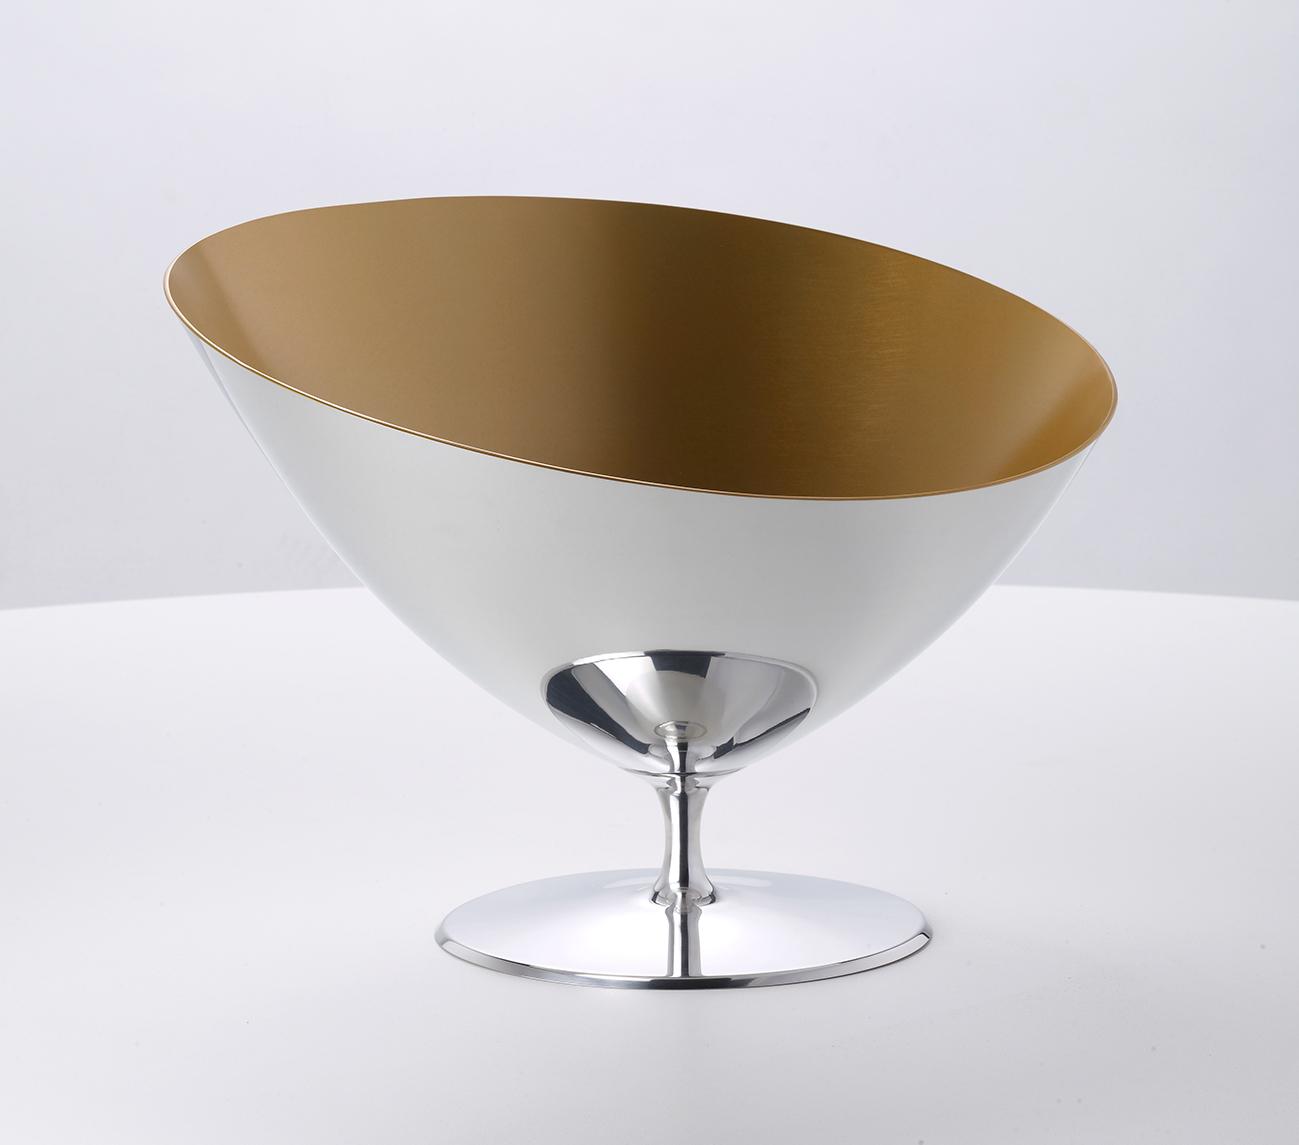 OA1710-seau-à-champagne-design-produit-agence-planet-design-eric-berthes02.jpg